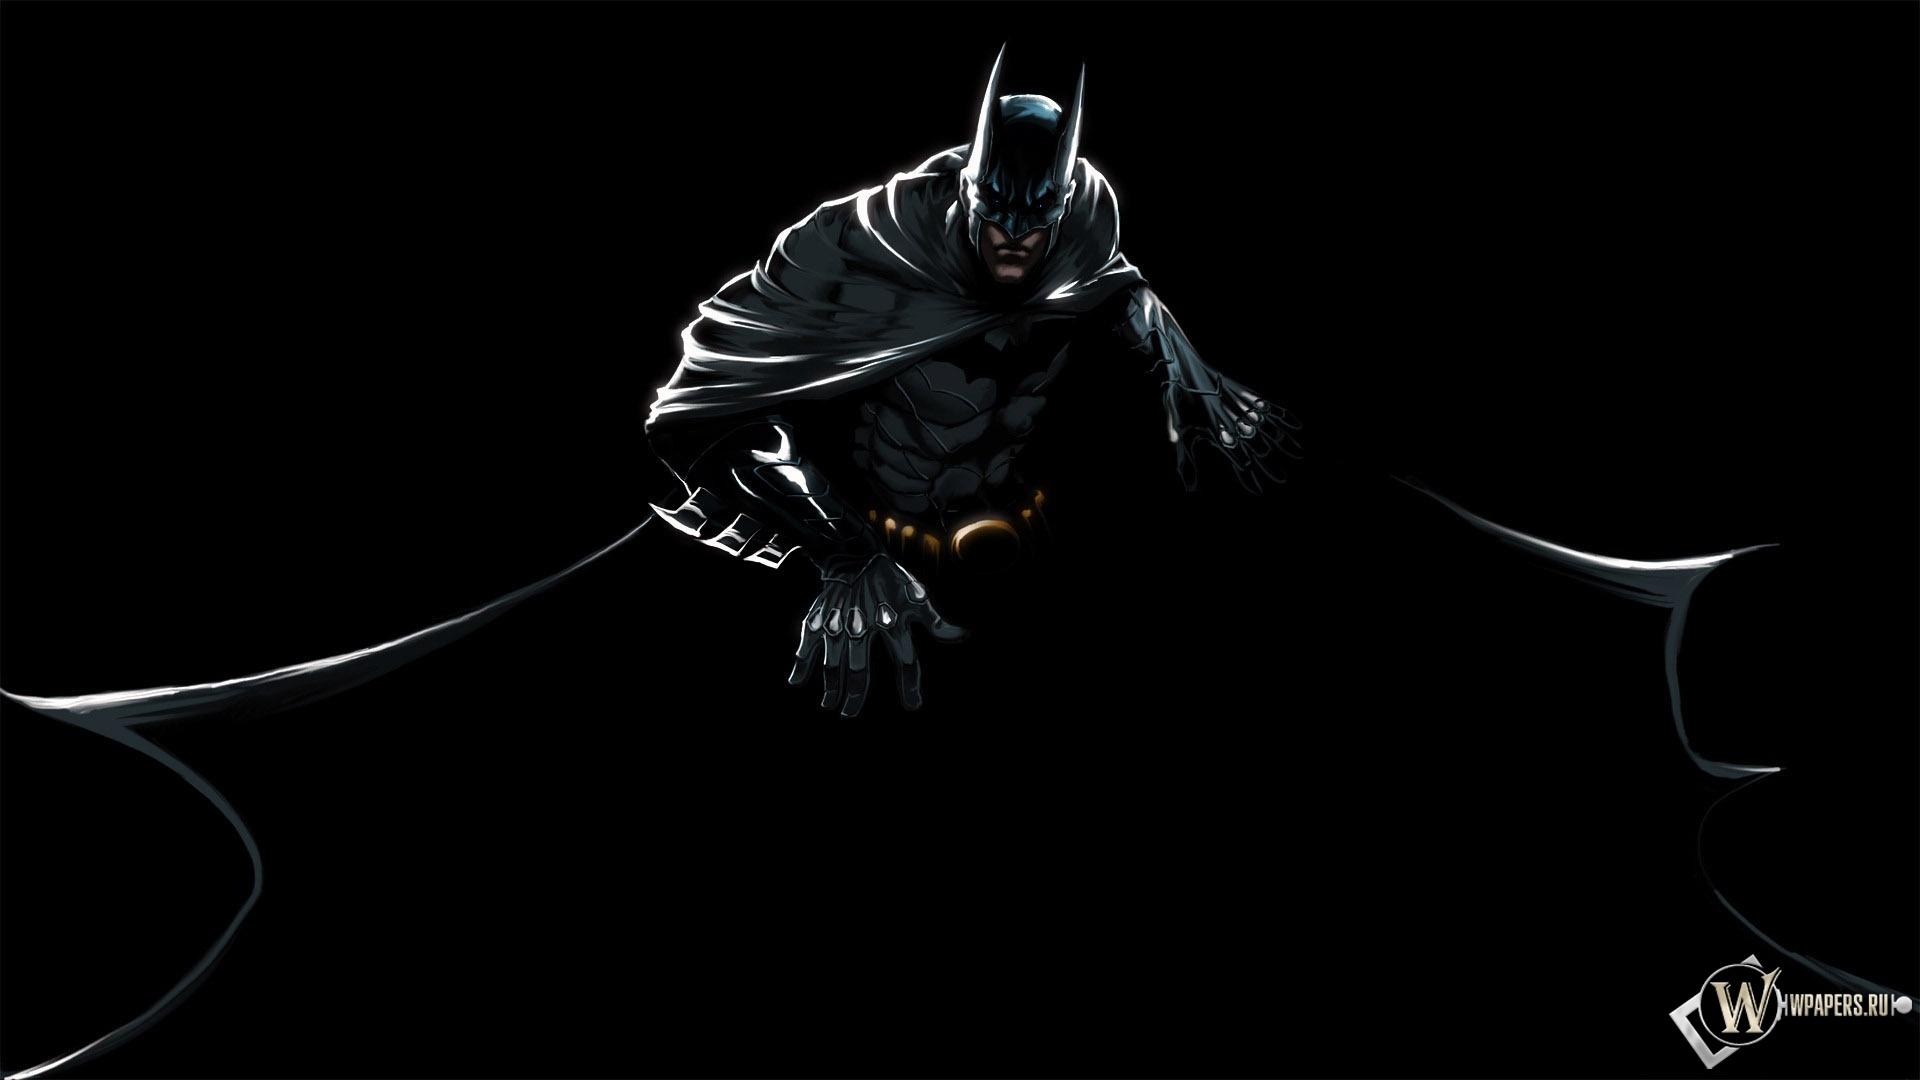 in thw dark batman wallpapers - photo #40